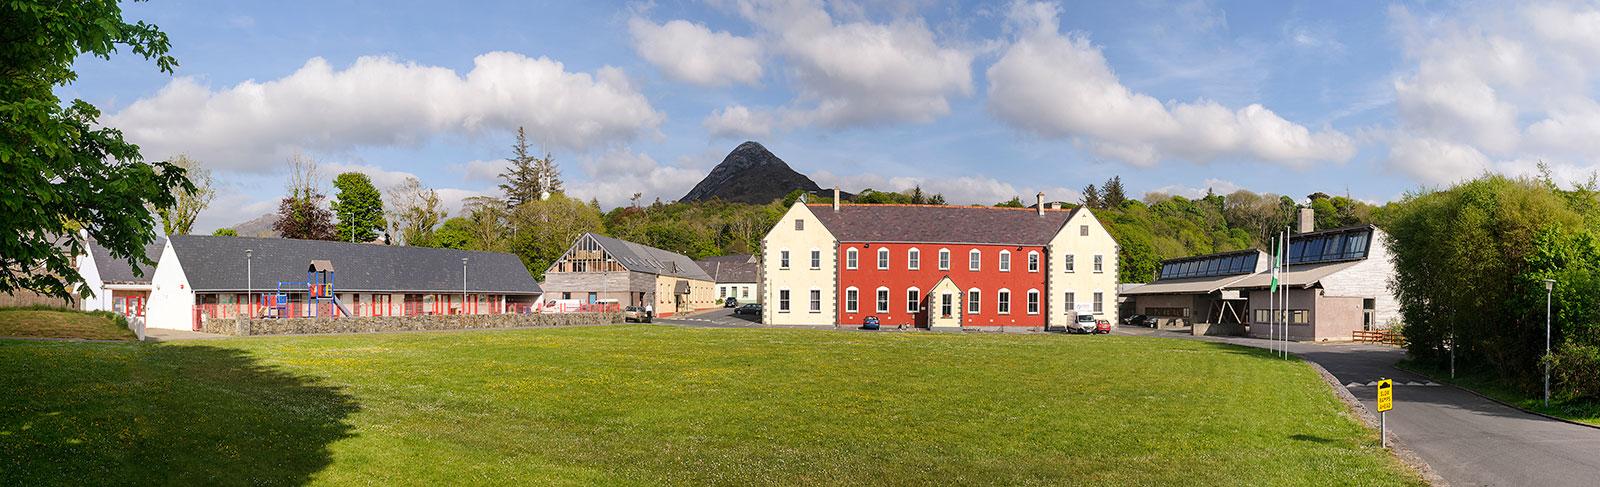 Connemara West, Letterfrack